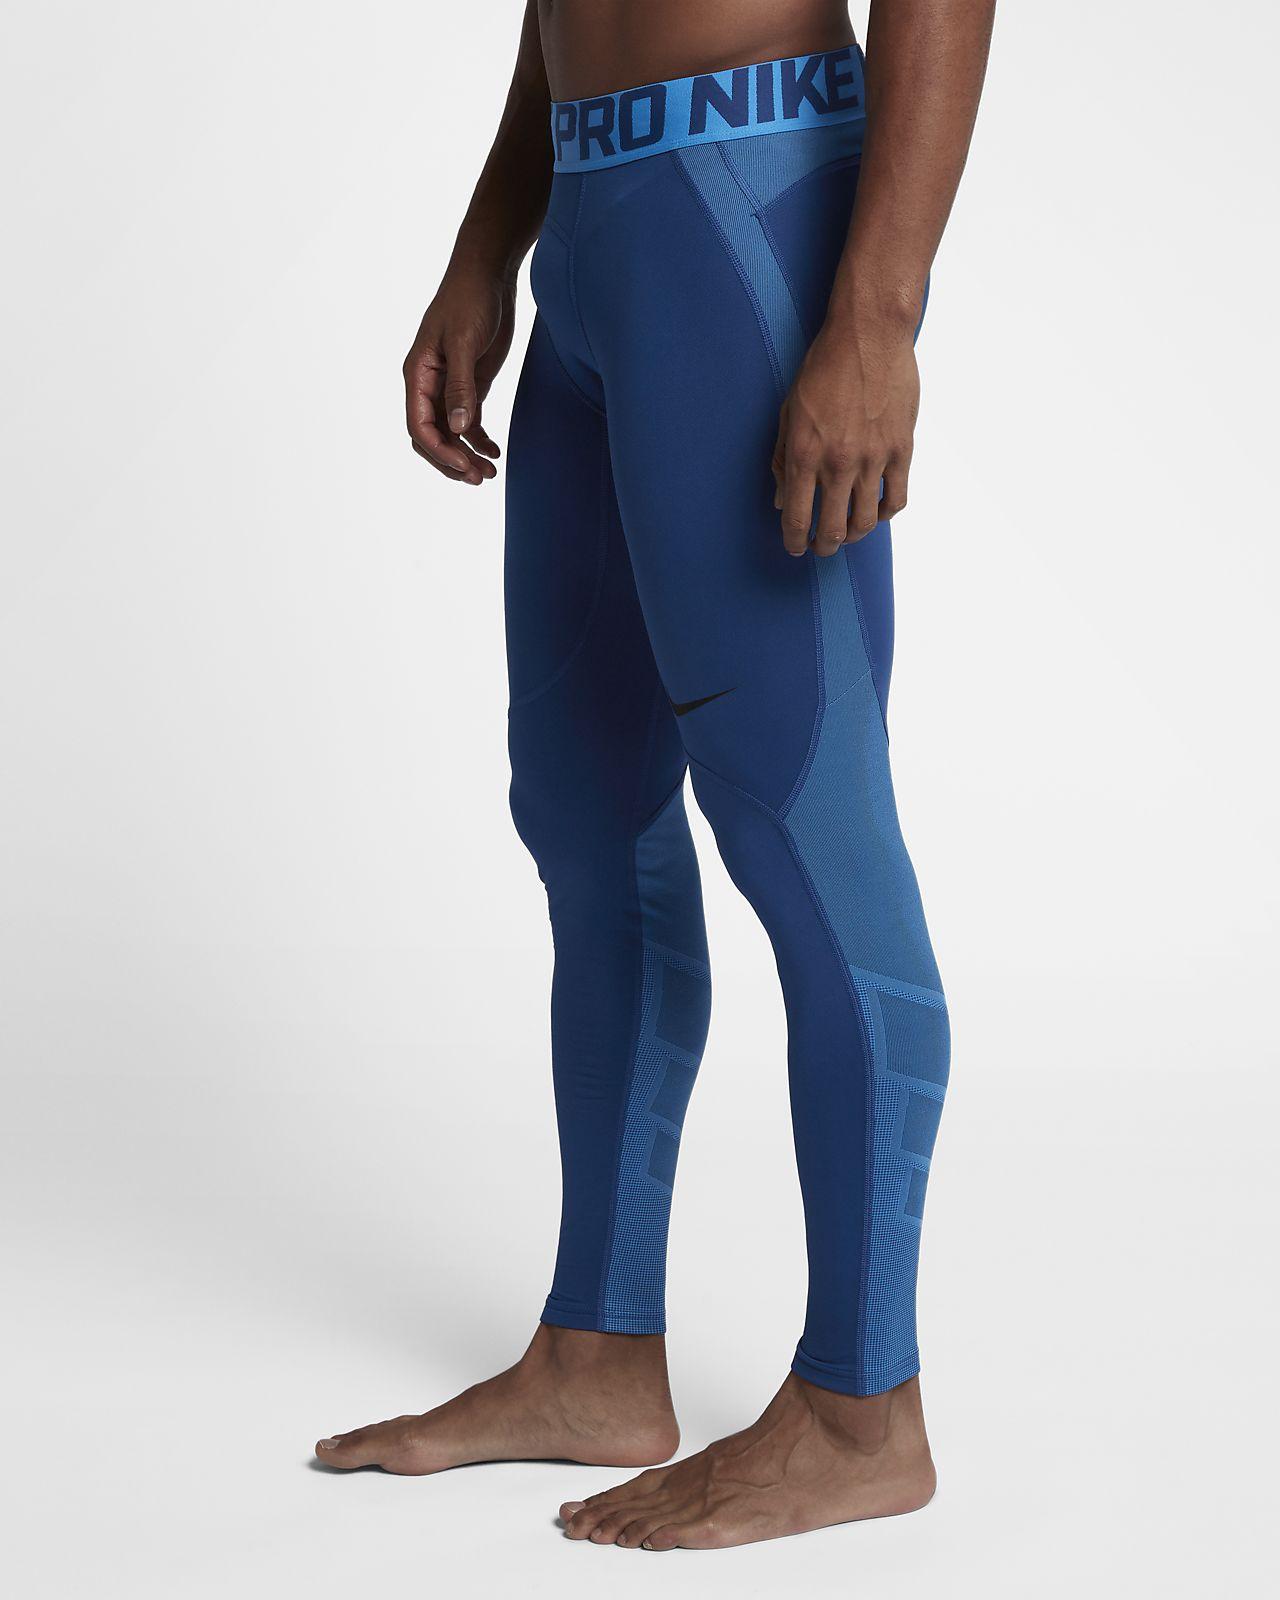 Nike Pro HyperWarm 男子保暖训练紧身裤